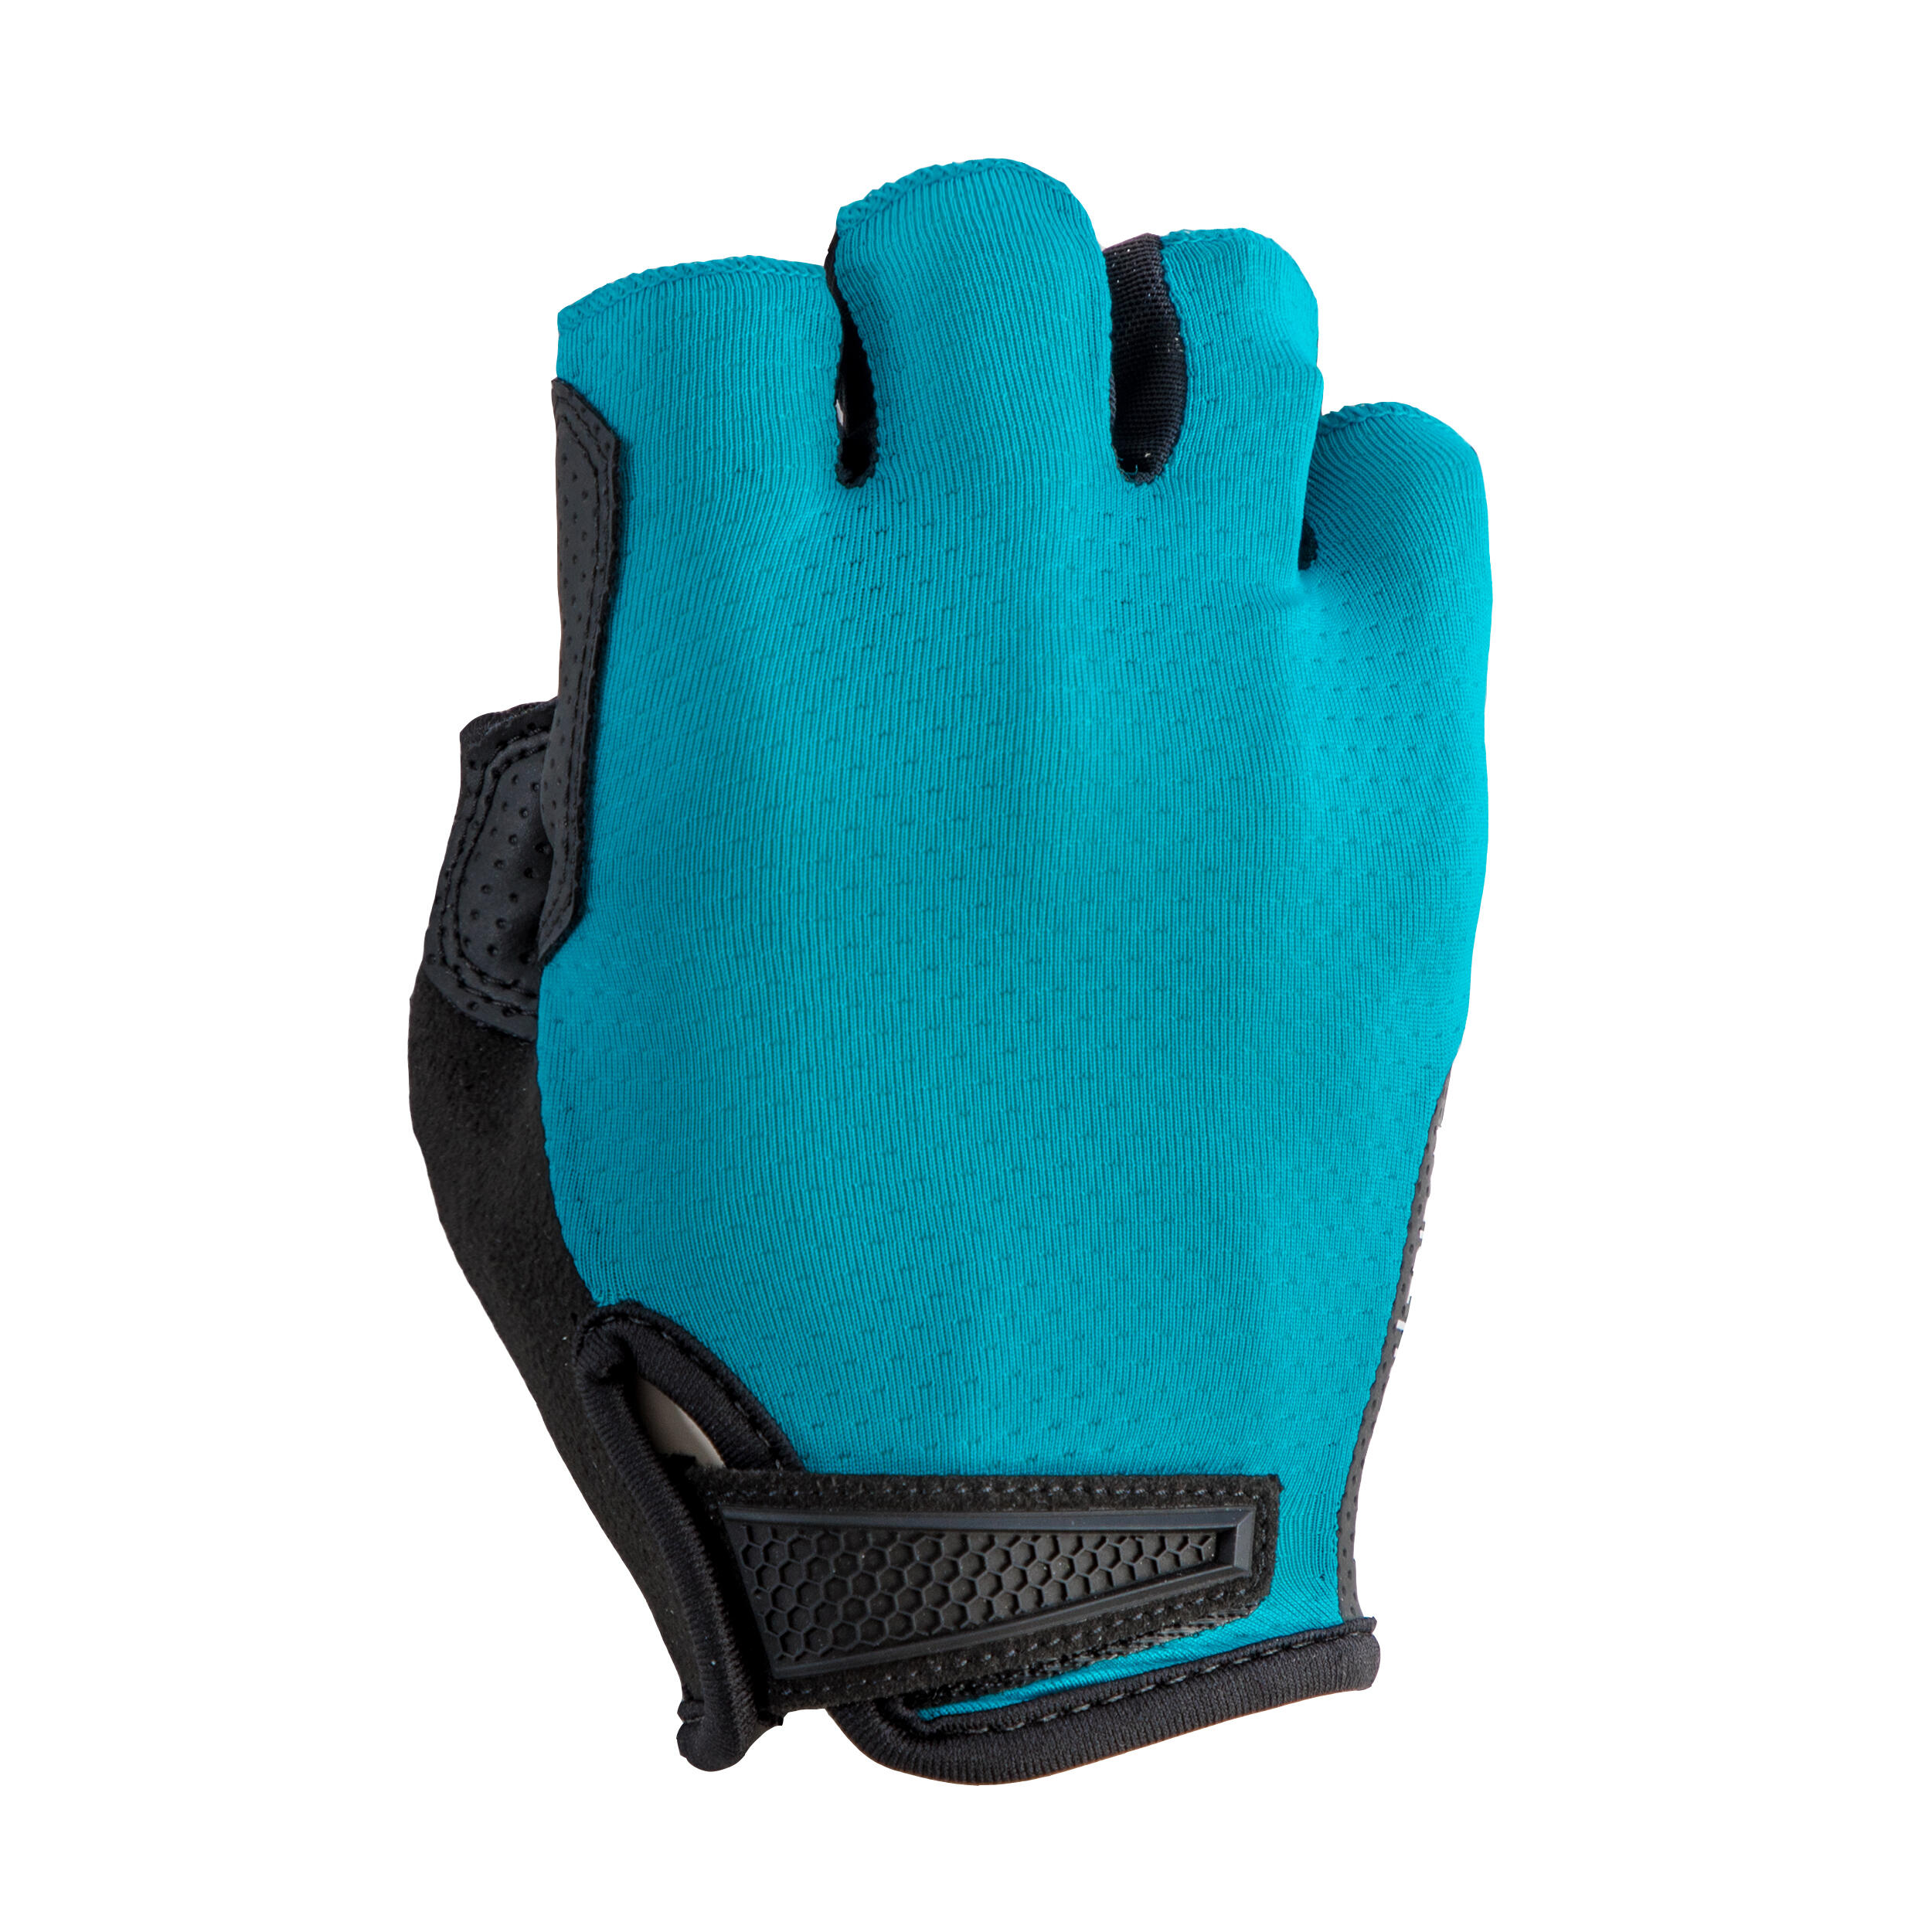 Fahrrad-Handschuhe 900 | Accessoires > Handschuhe | Triban